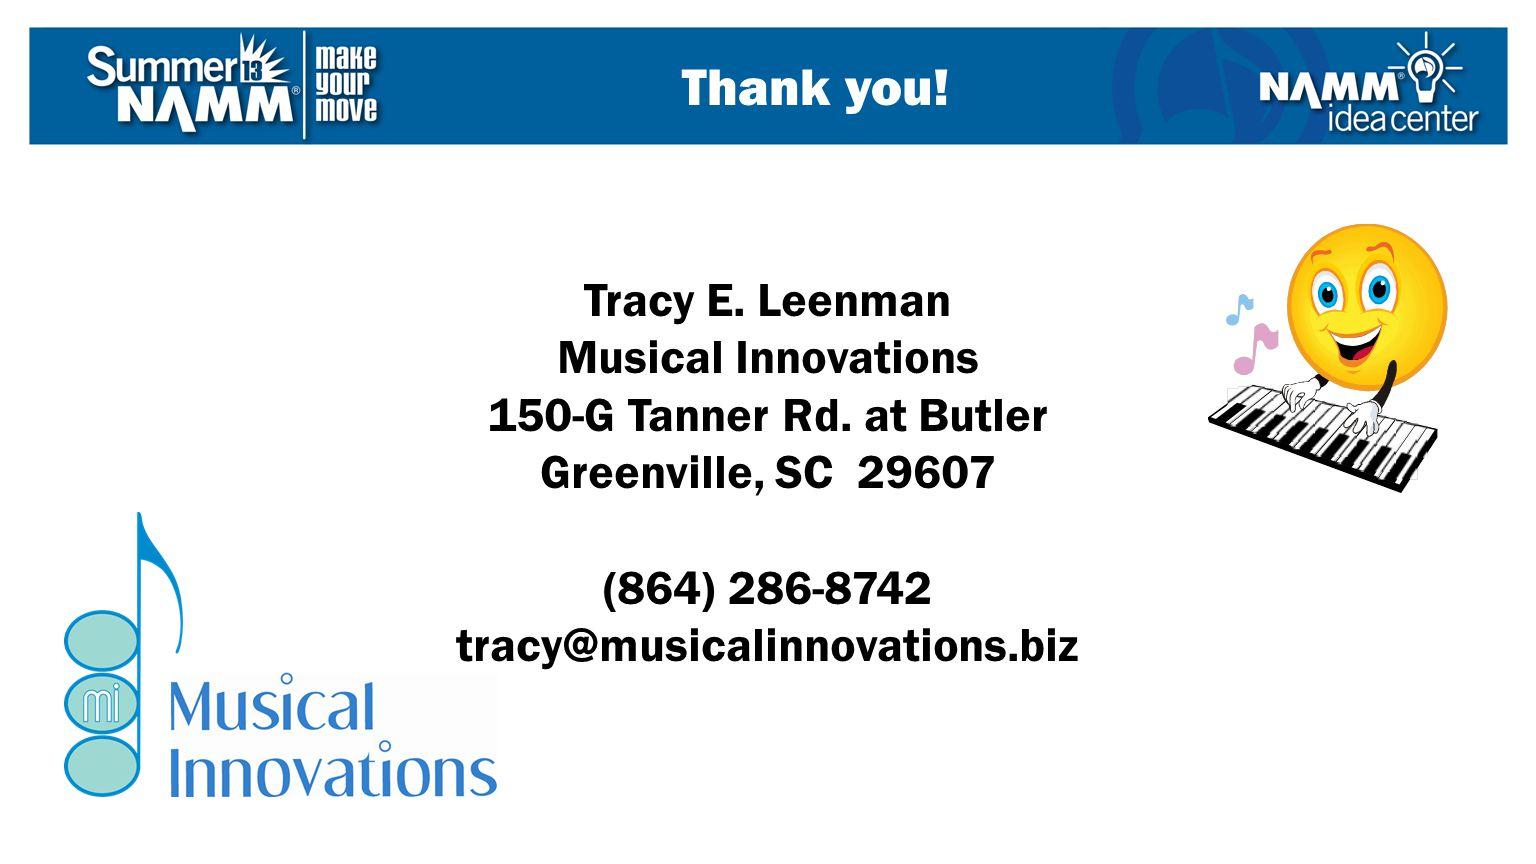 Tracy E. Leenman Musical Innovations 150-G Tanner Rd.